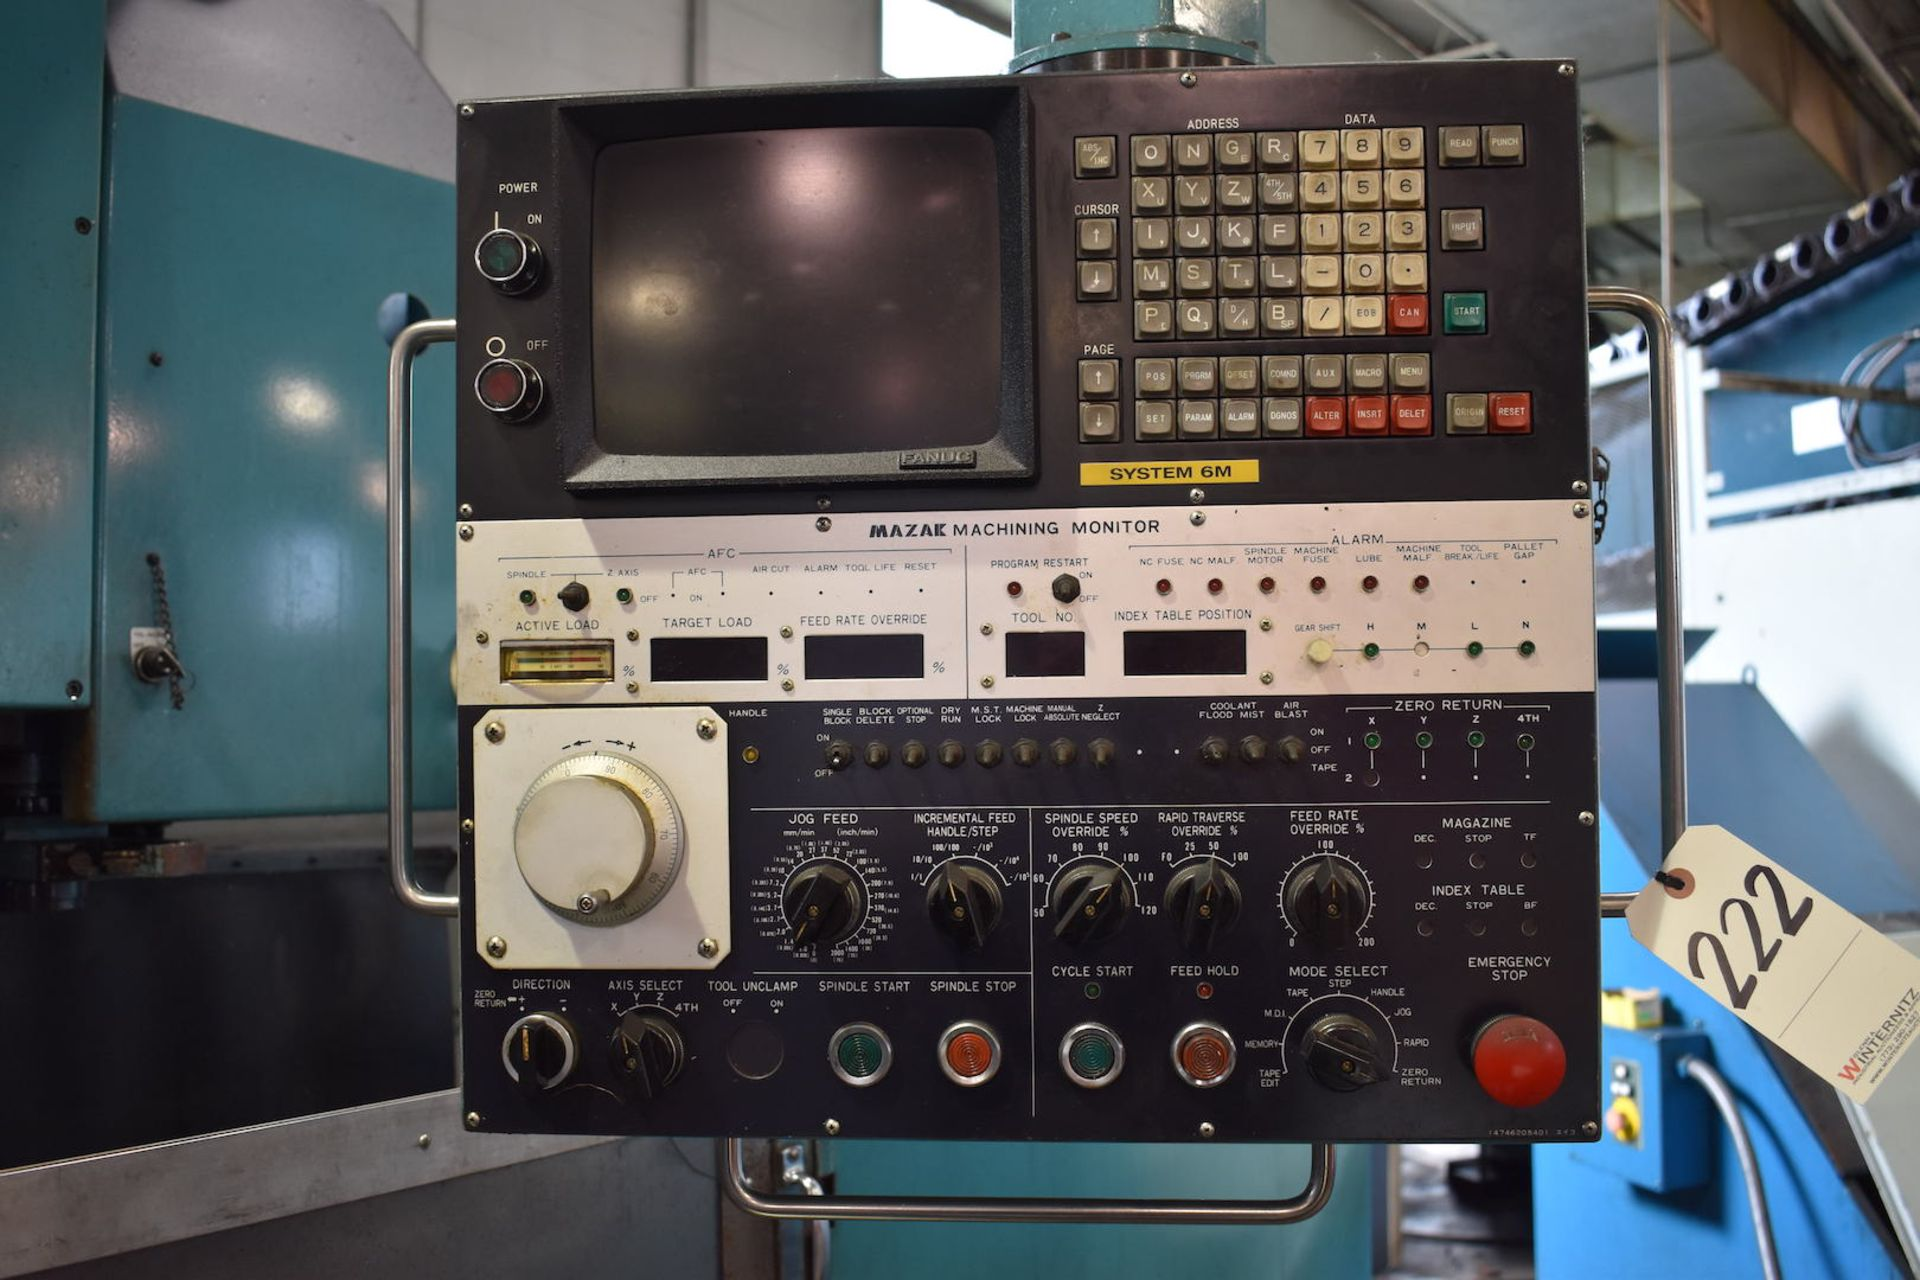 Lot 222 - Mazak Model Twin Center V-10TS Twin-Spindle CNC Vertical Machining Center, S/N 60972 (1985), Fanuc